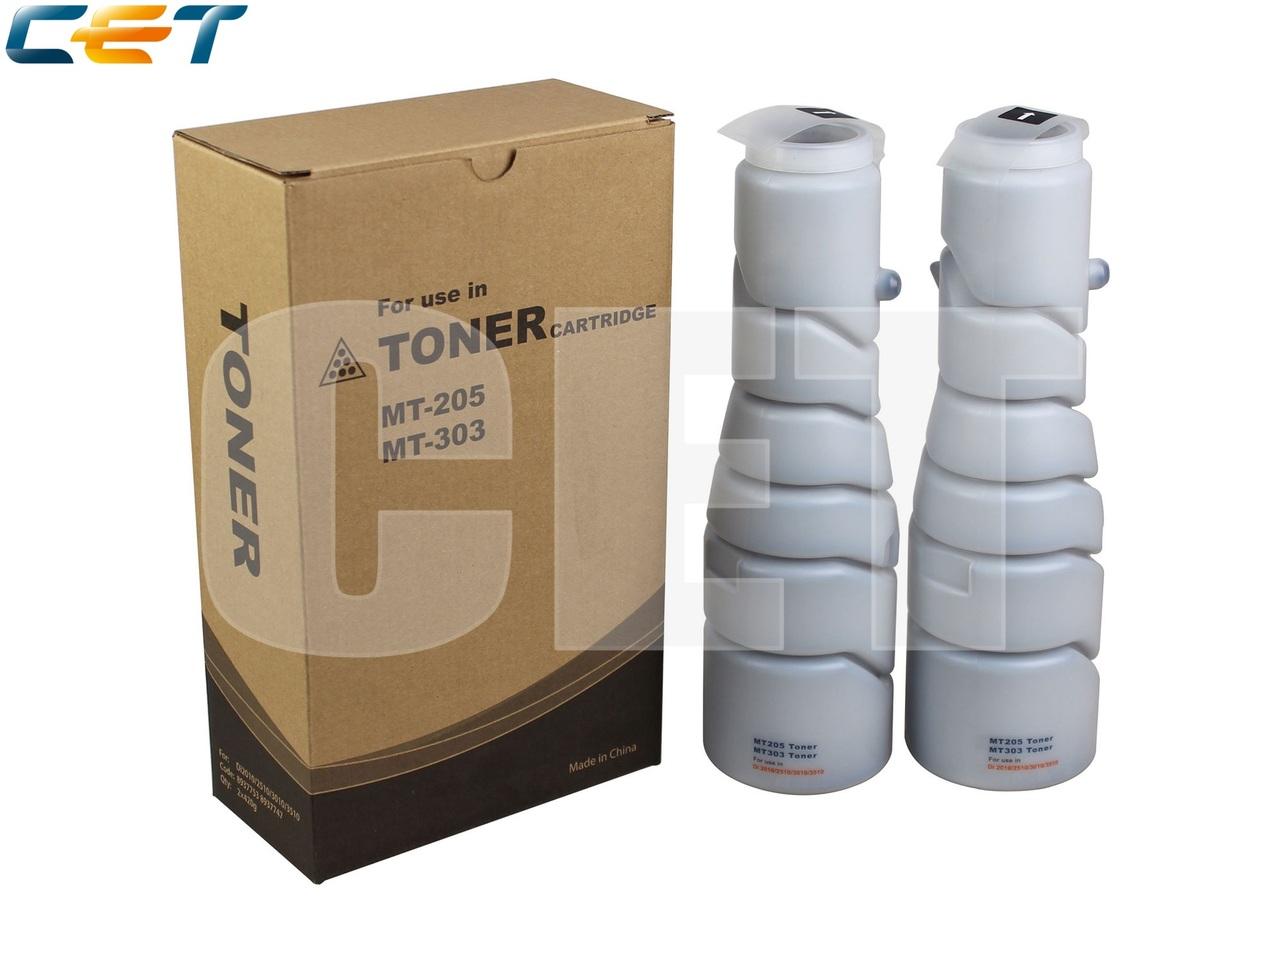 Тонер-картридж MT-205/MT-303 для KONICA MINOLTADi2010/2510/3010/3510 (CET), 420г, 14000 стр., CET6704